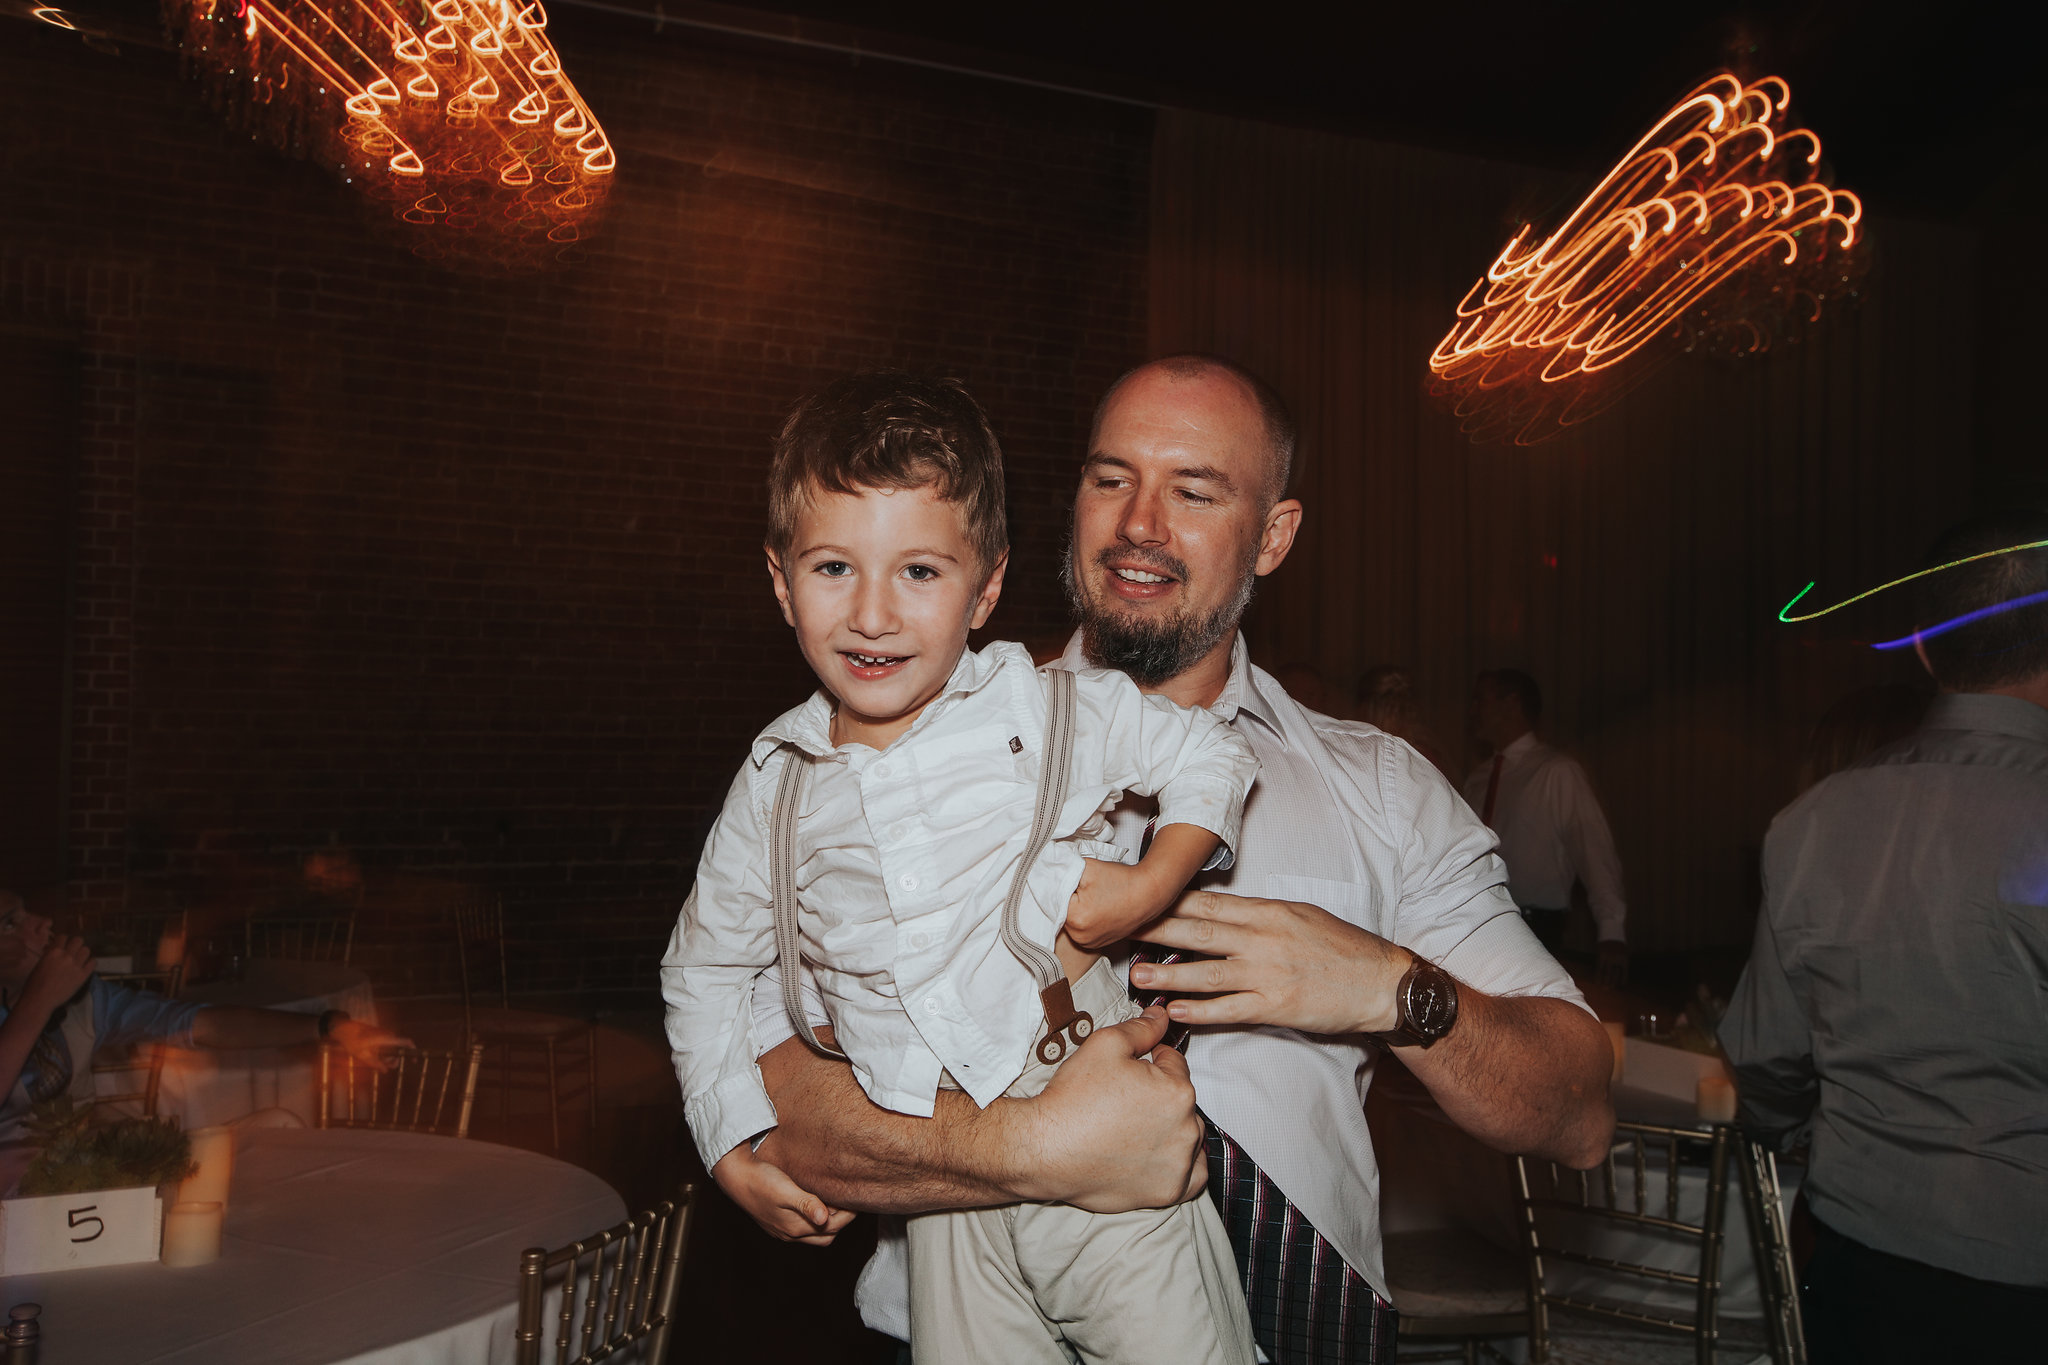 vacaville-opera-house-wedding-photographer